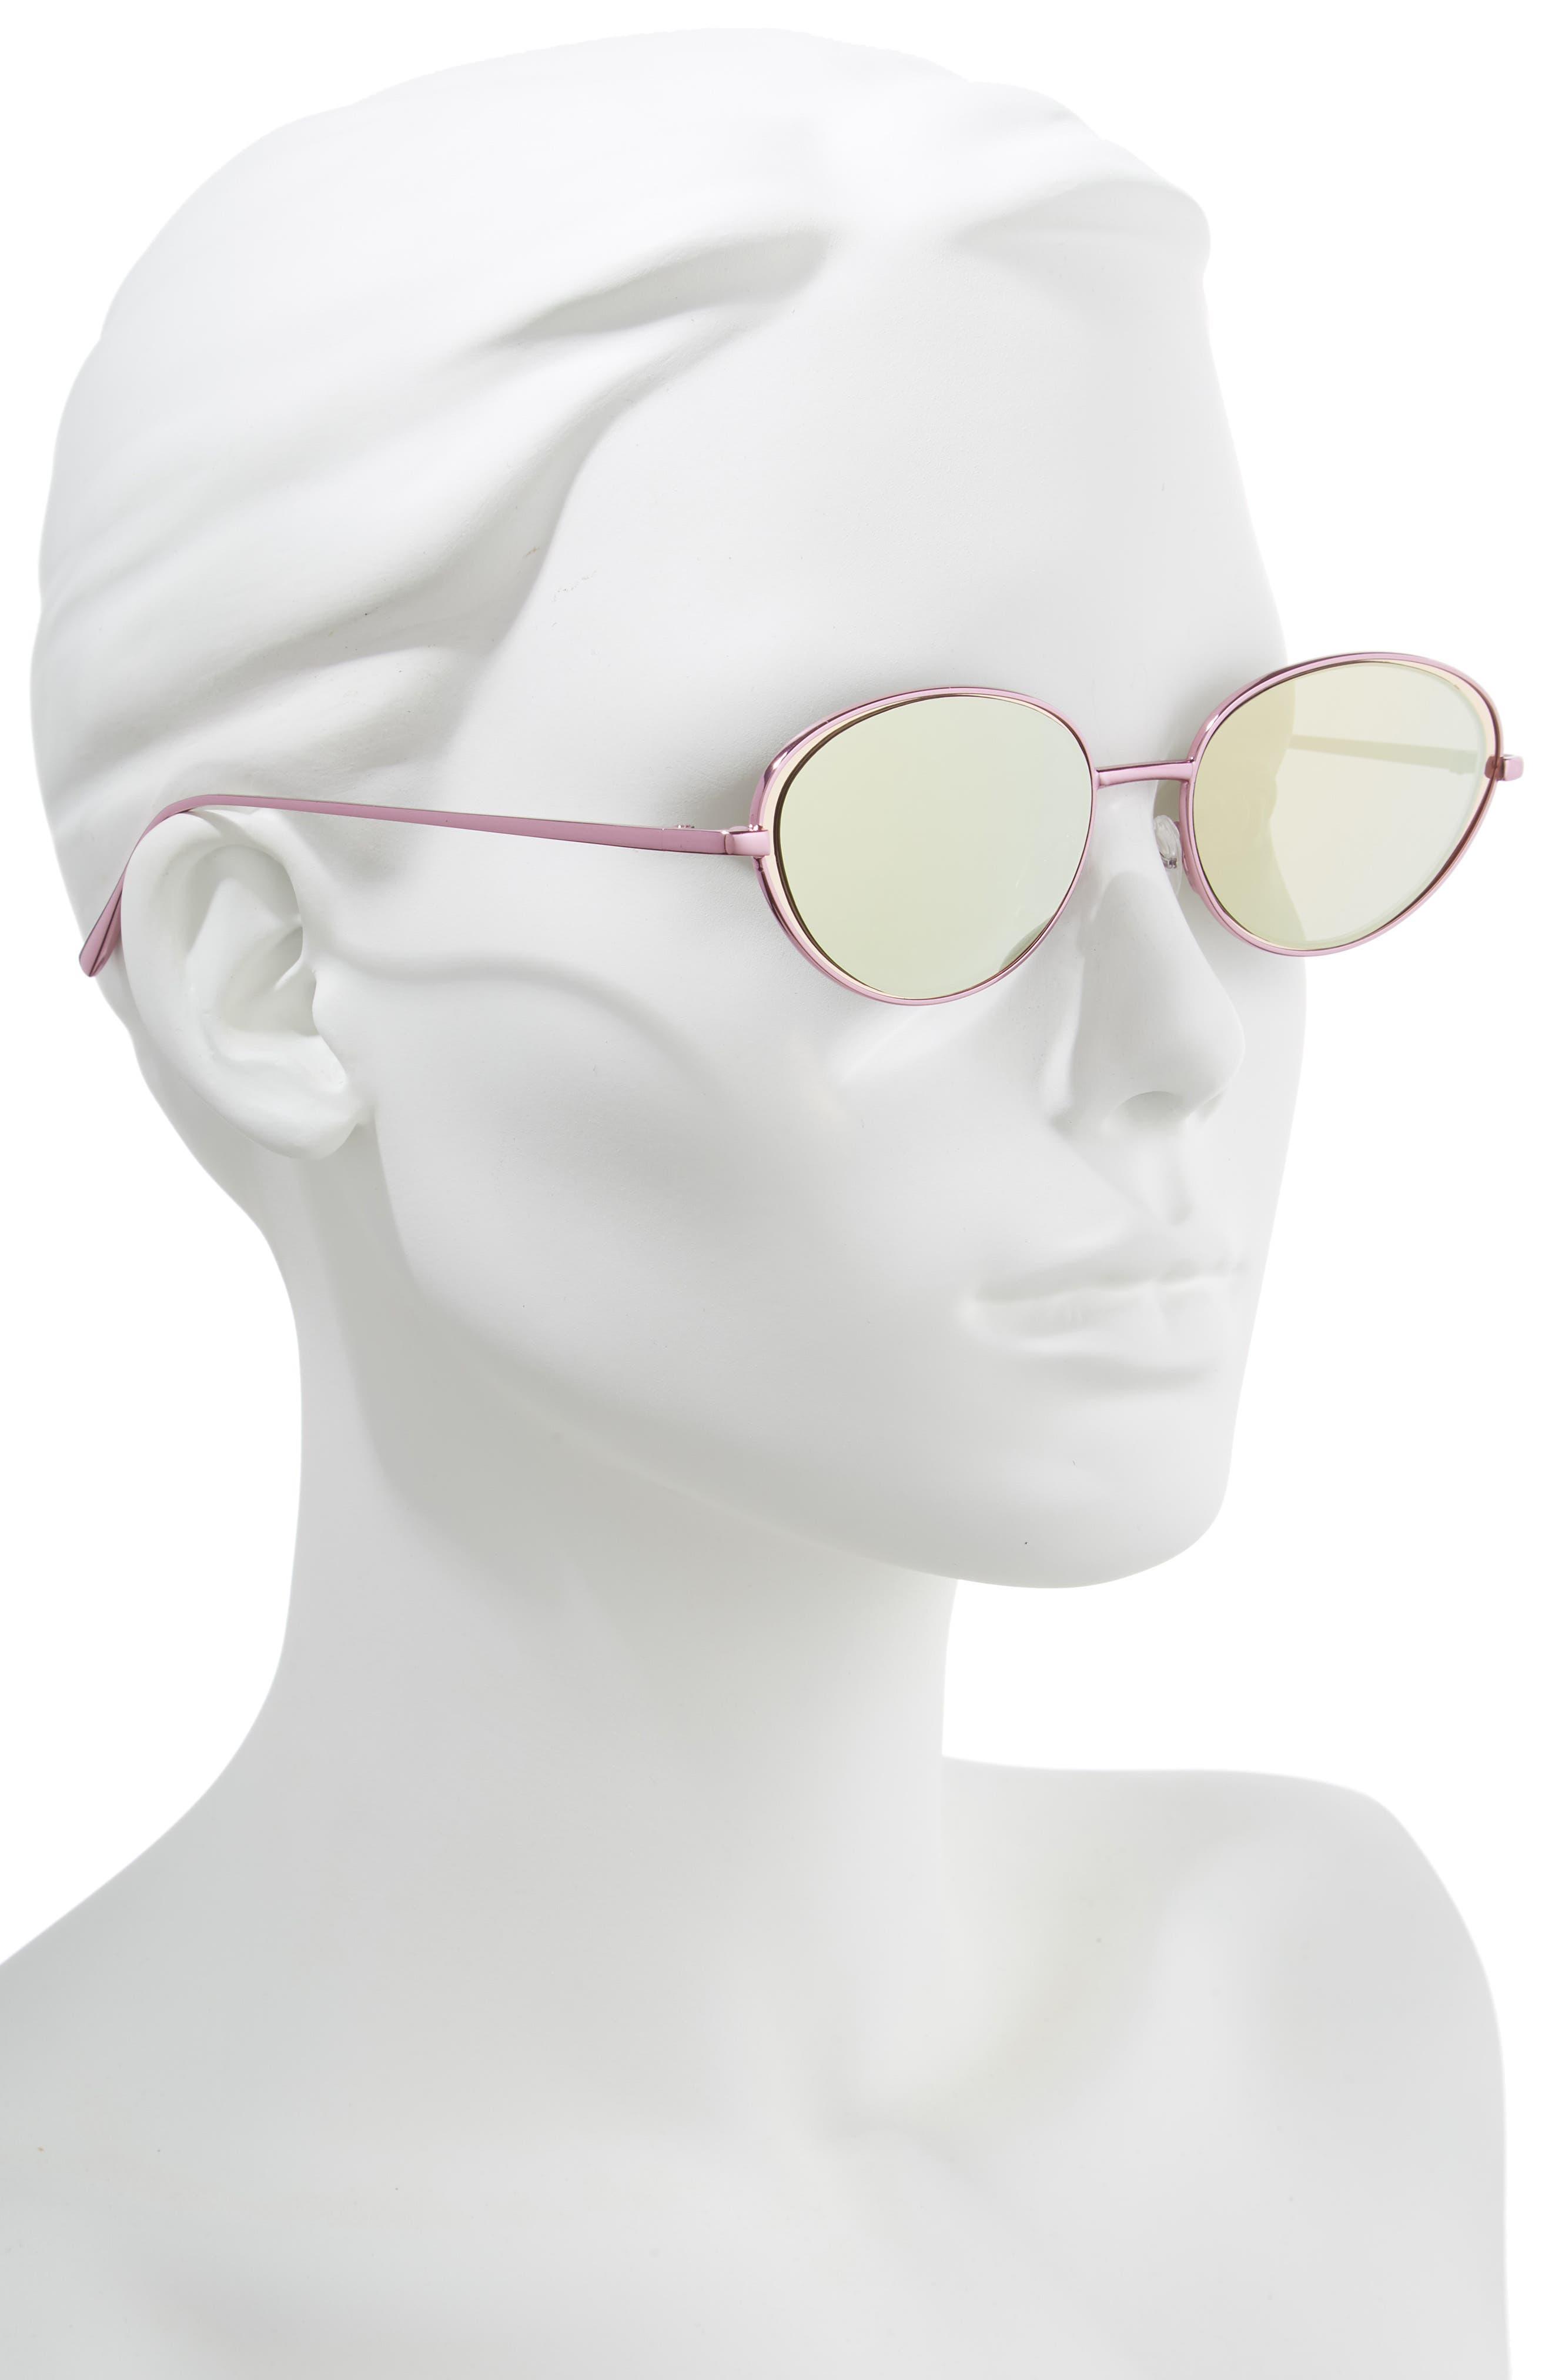 57mm Oval Sunglasses,                             Alternate thumbnail 2, color,                             650